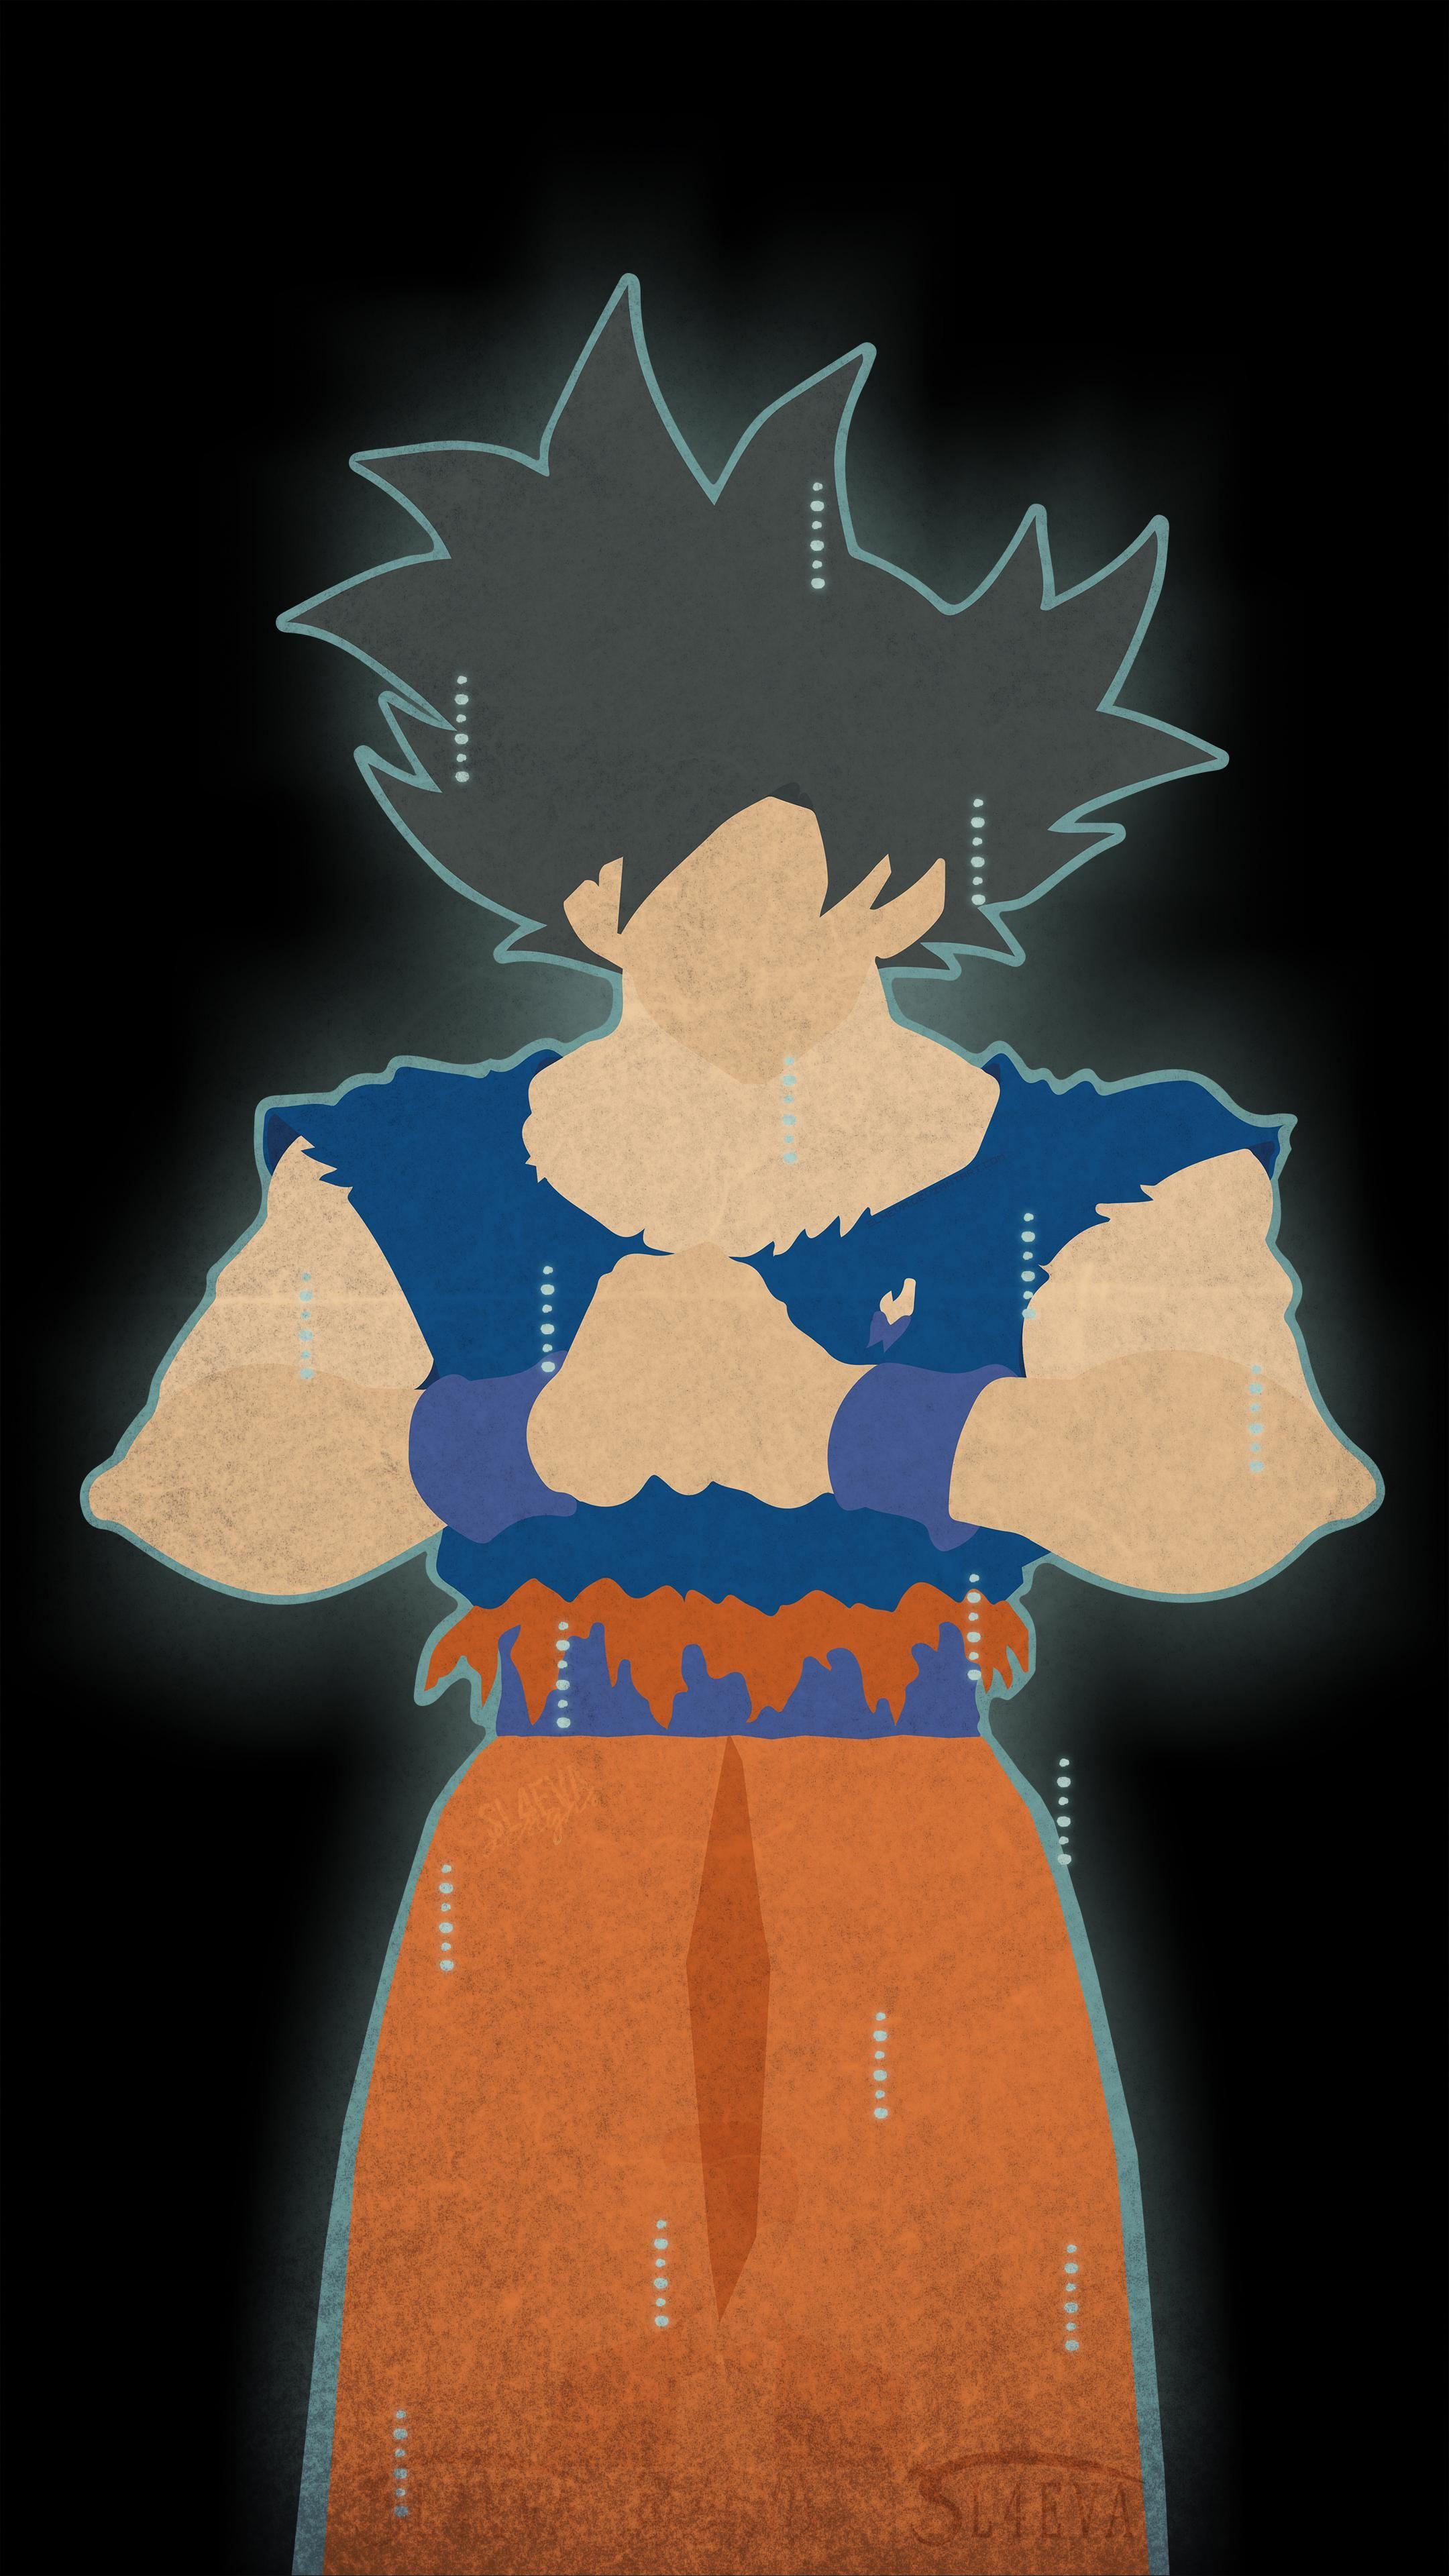 2160x3840 Ultra Instinct Goku Minimal Mobile Wallpaper I Redd It Submitted By Rikudosenjutsu To R A Zen Wall Art Psychedelic Illustration Mobile Wallpaper